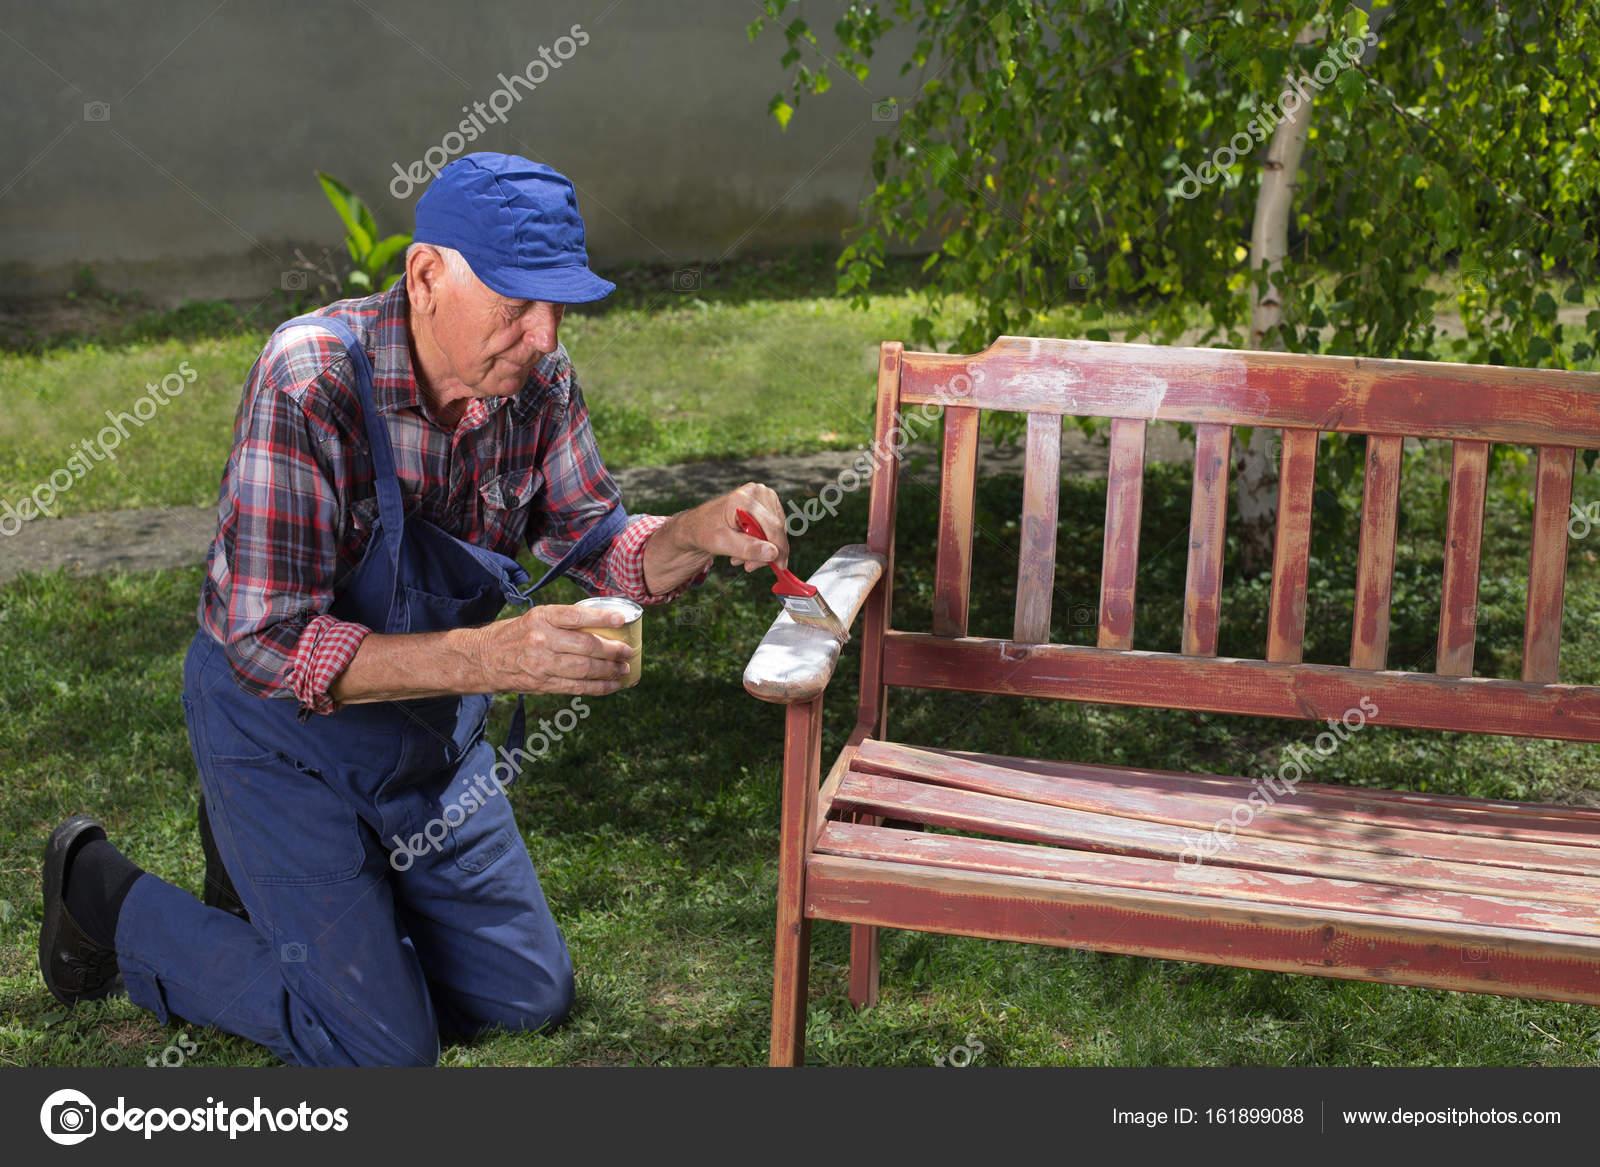 Peachy Old Man Painting Bench In Garden Stock Photo C Budabar Machost Co Dining Chair Design Ideas Machostcouk